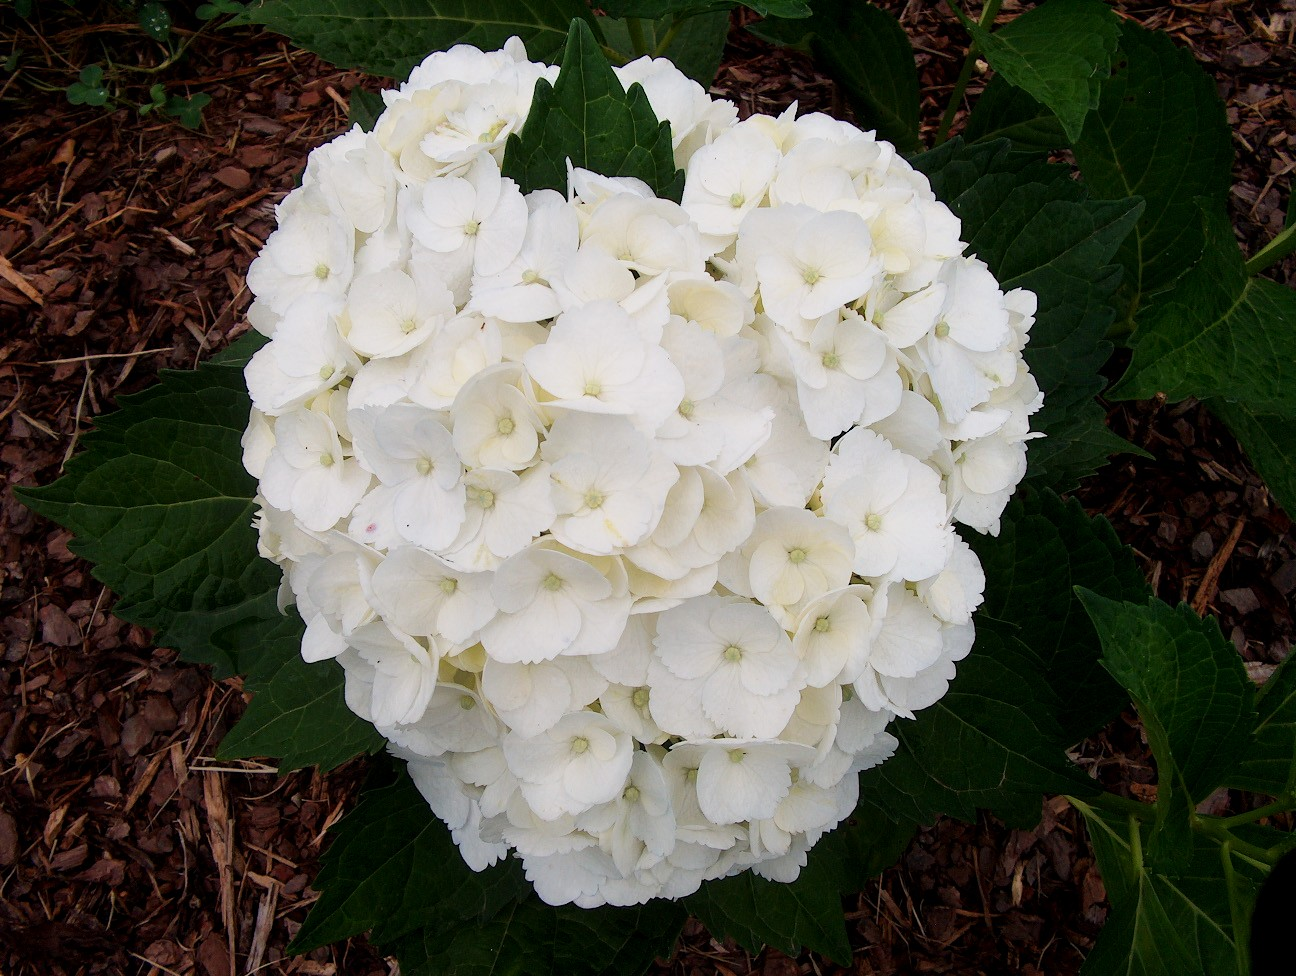 Hydrangea macrophylla 'Madame Emile Mouillere' / Hydrangea macrophylla 'Madame Emile Mouillere'